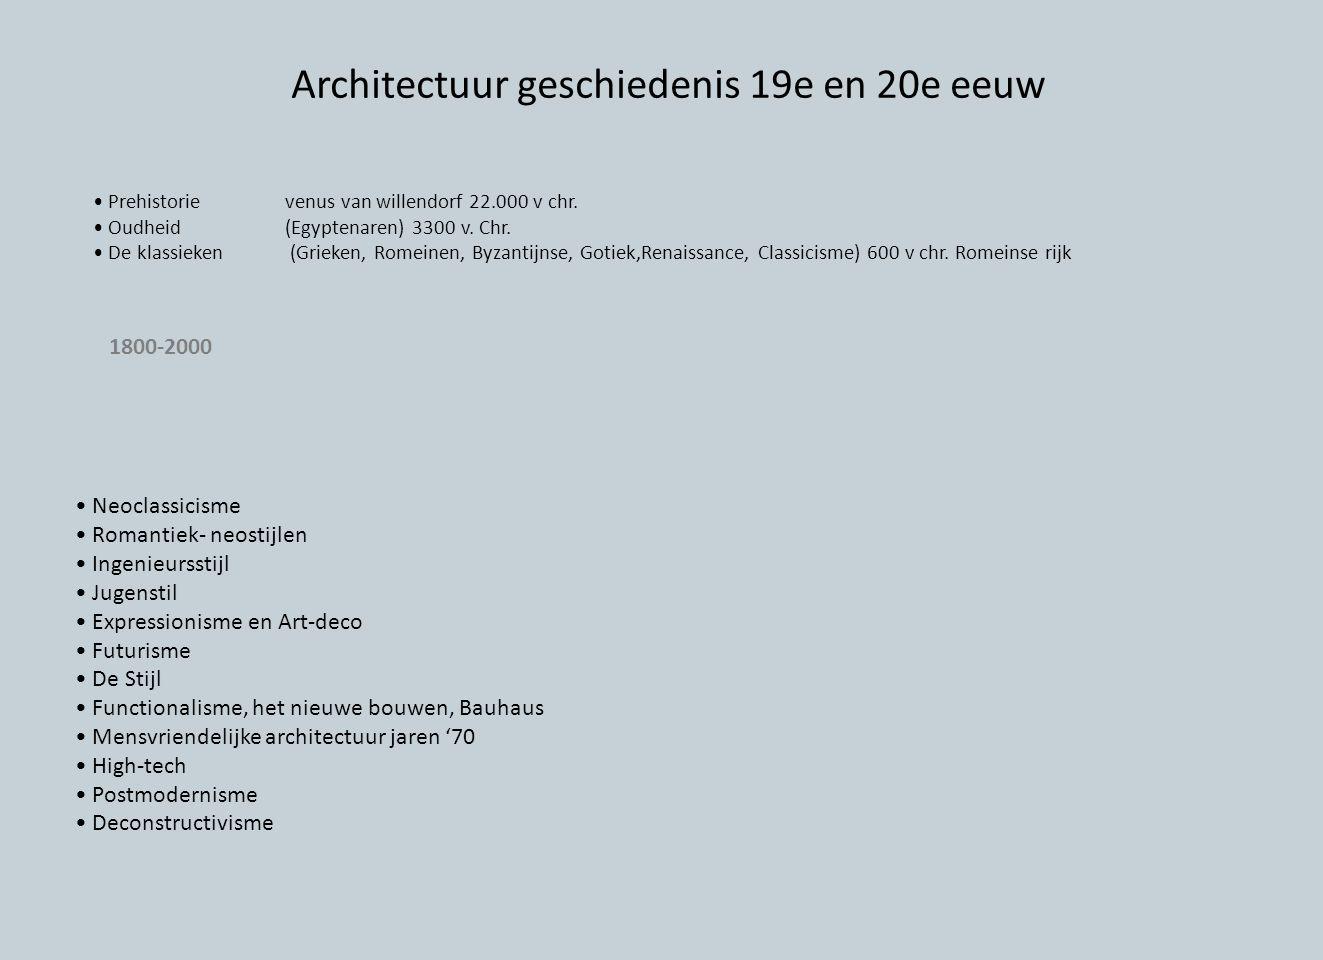 Neoclassicisme Romantiek- neostijlen Ingenieursstijl Jugenstil Expressionisme en Art-deco Futurisme De Stijl Functionalisme, het nieuwe bouwen, Bauhaus Mensvriendelijke architectuur jaren '70 High-tech Postmodernisme Deconstructivisme Prehistorievenus van willendorf 22.000 v chr.